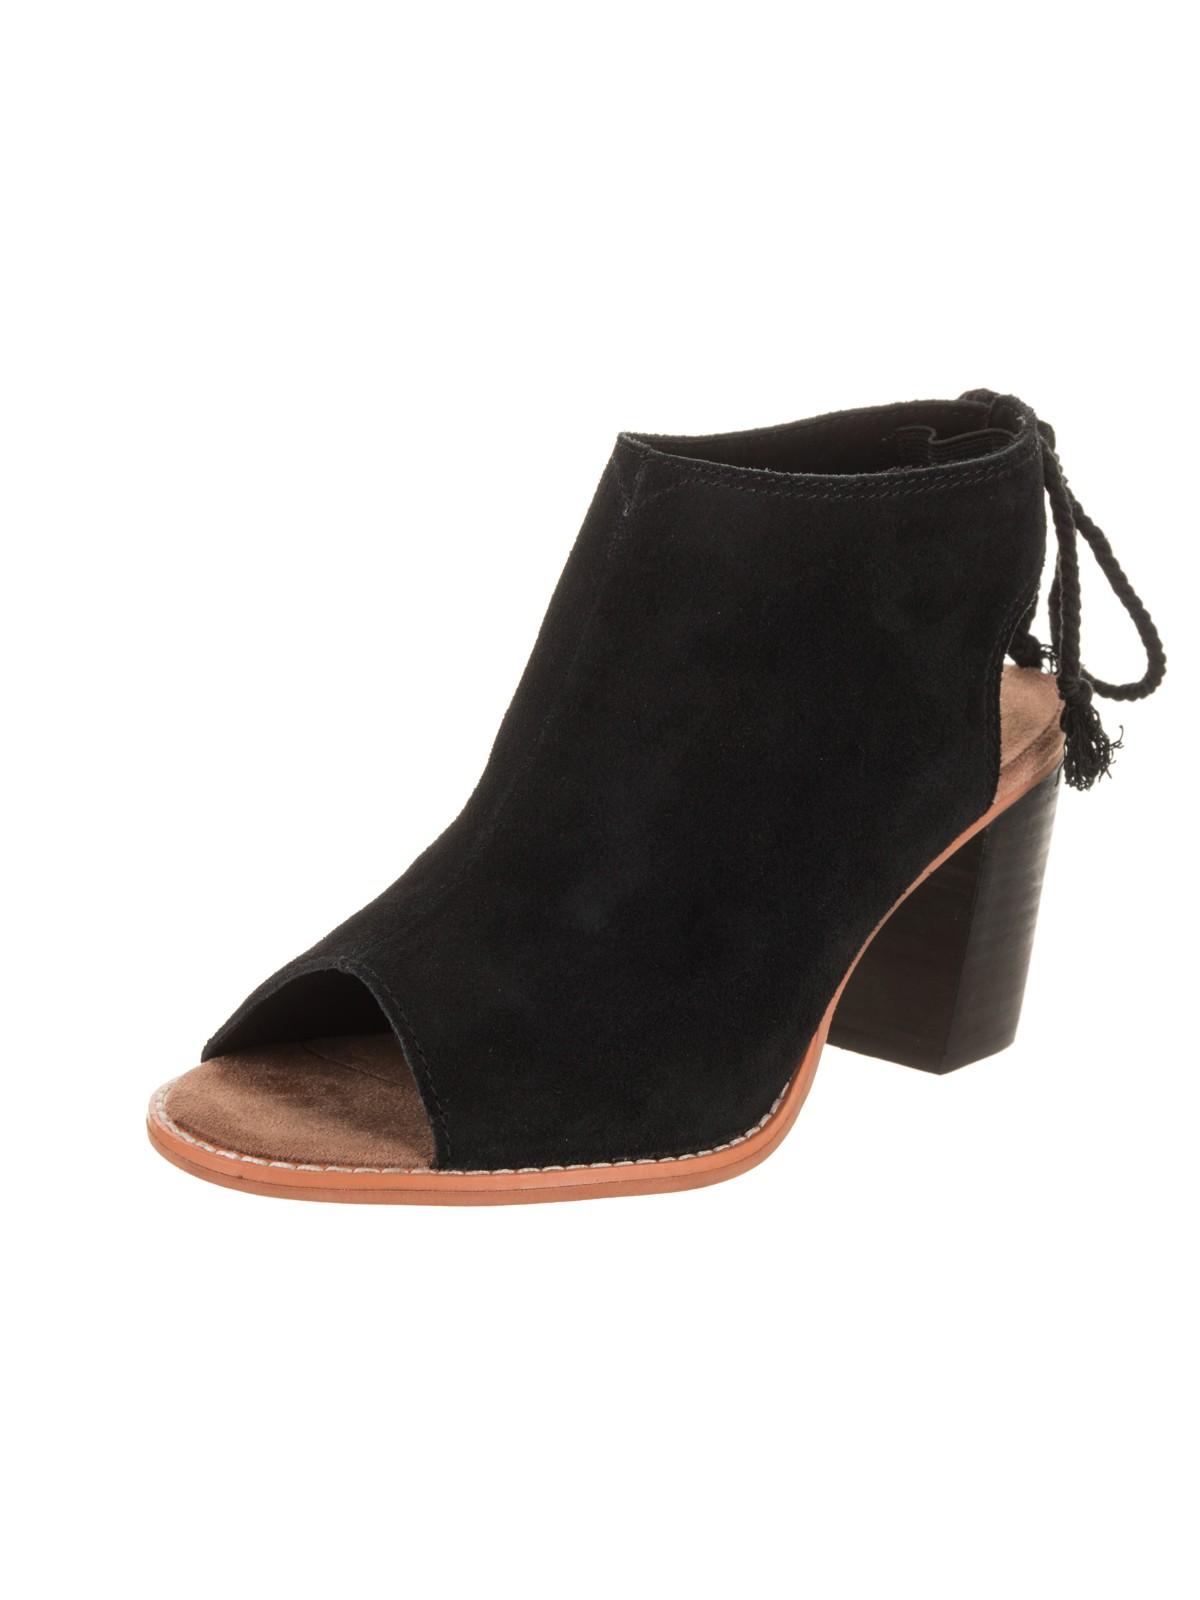 toms women's elba sandal